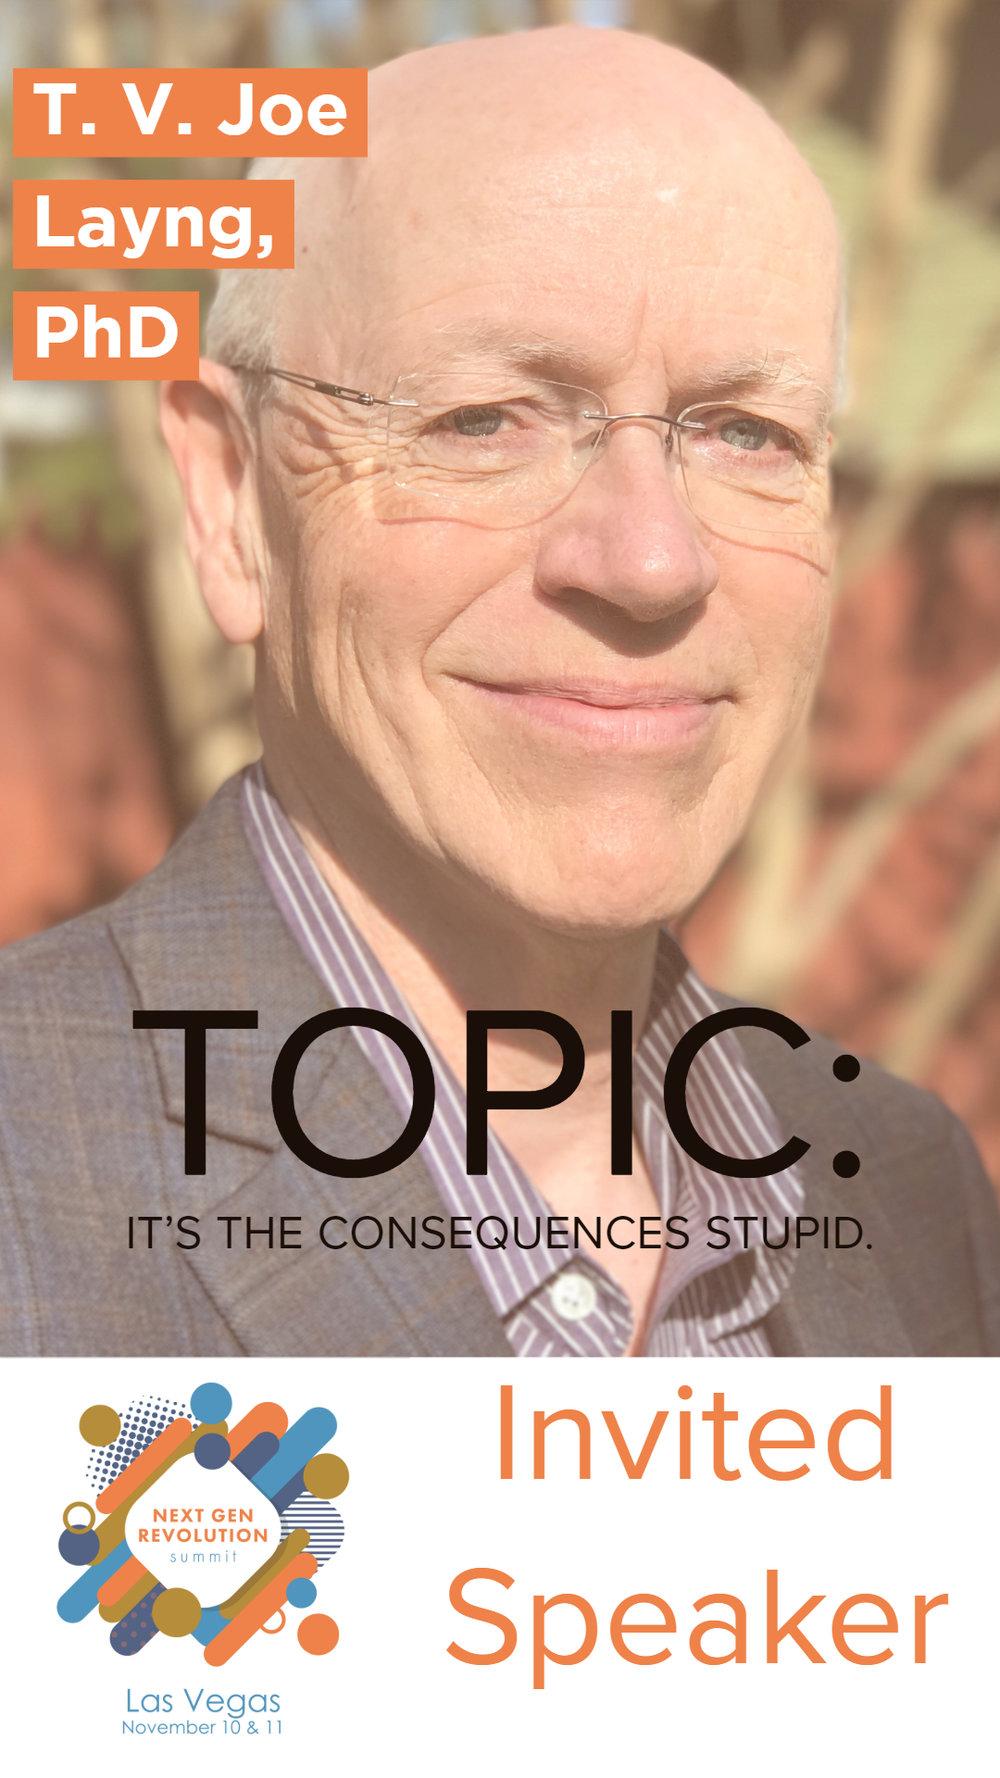 T. V. Joe Layng, PhD